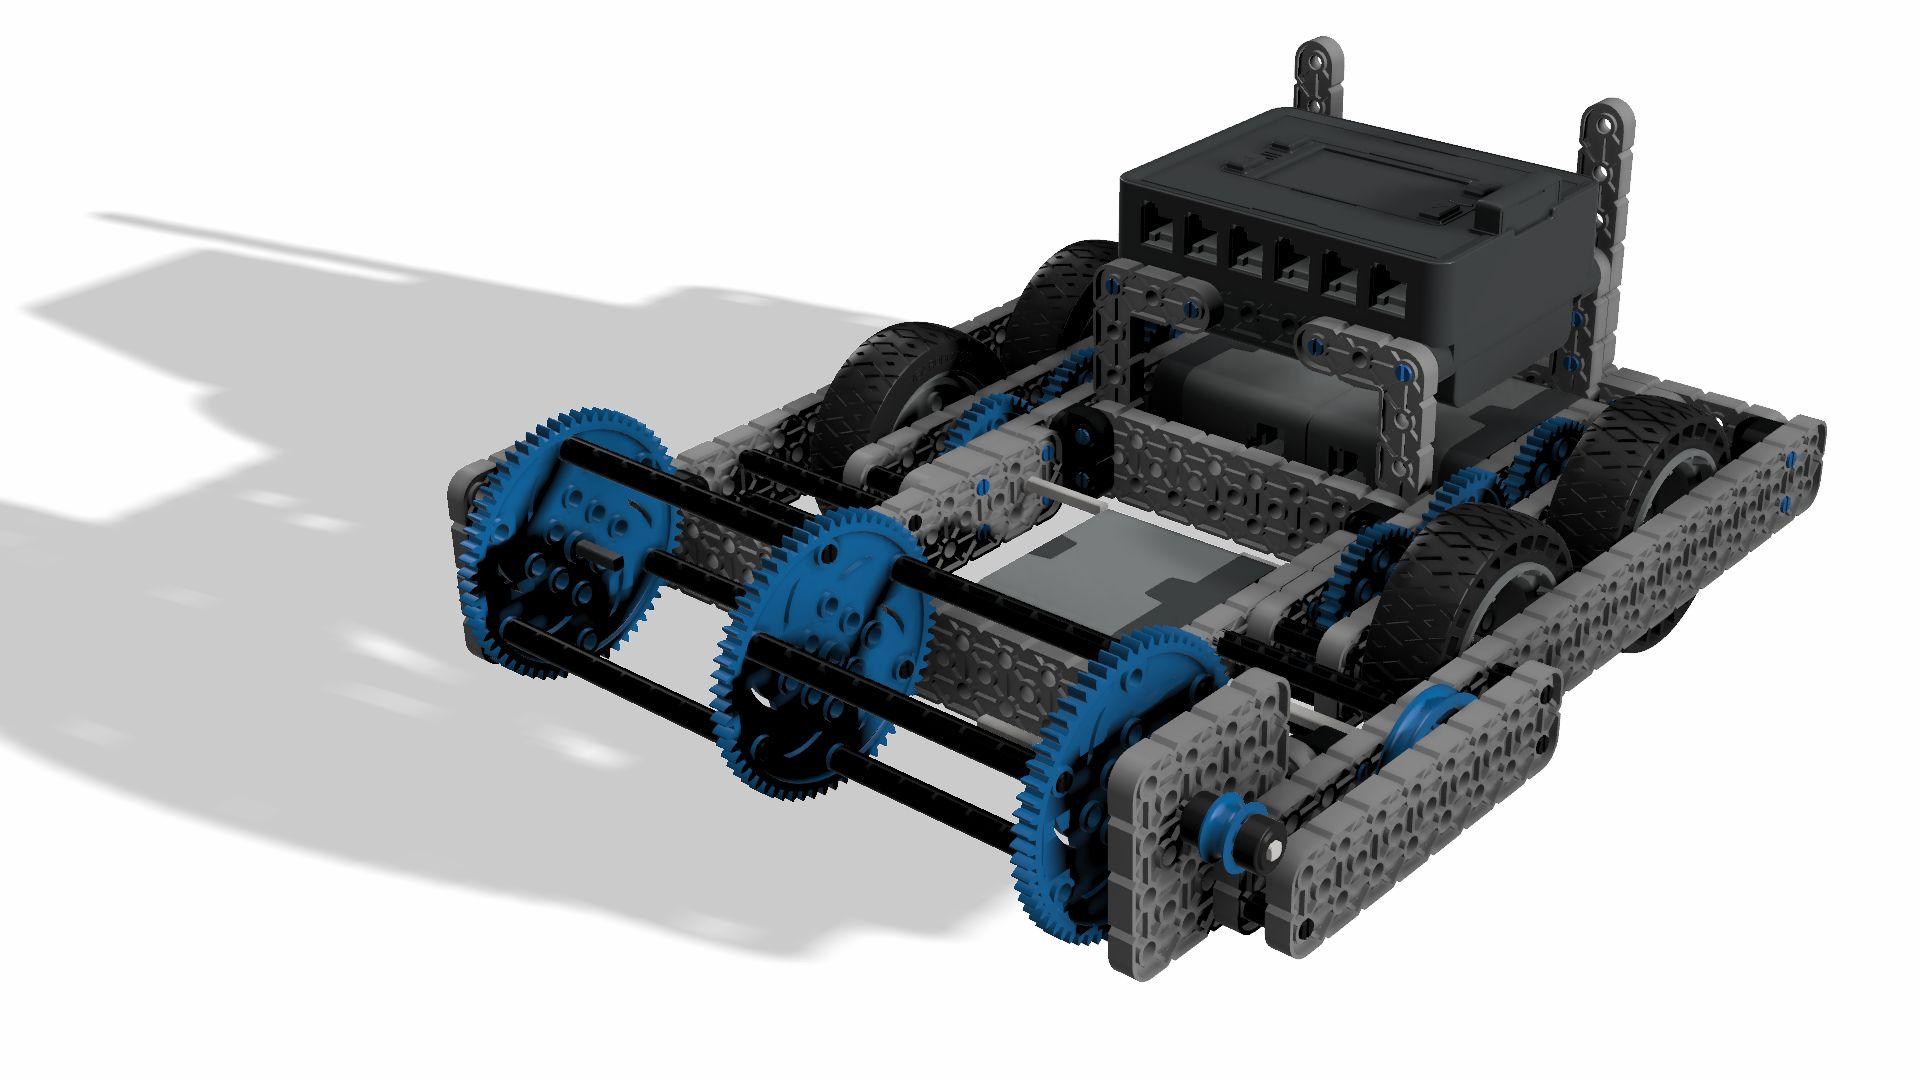 Standard-drive-base-2-v11-v21qwqqqqqqqqq-3500-3500